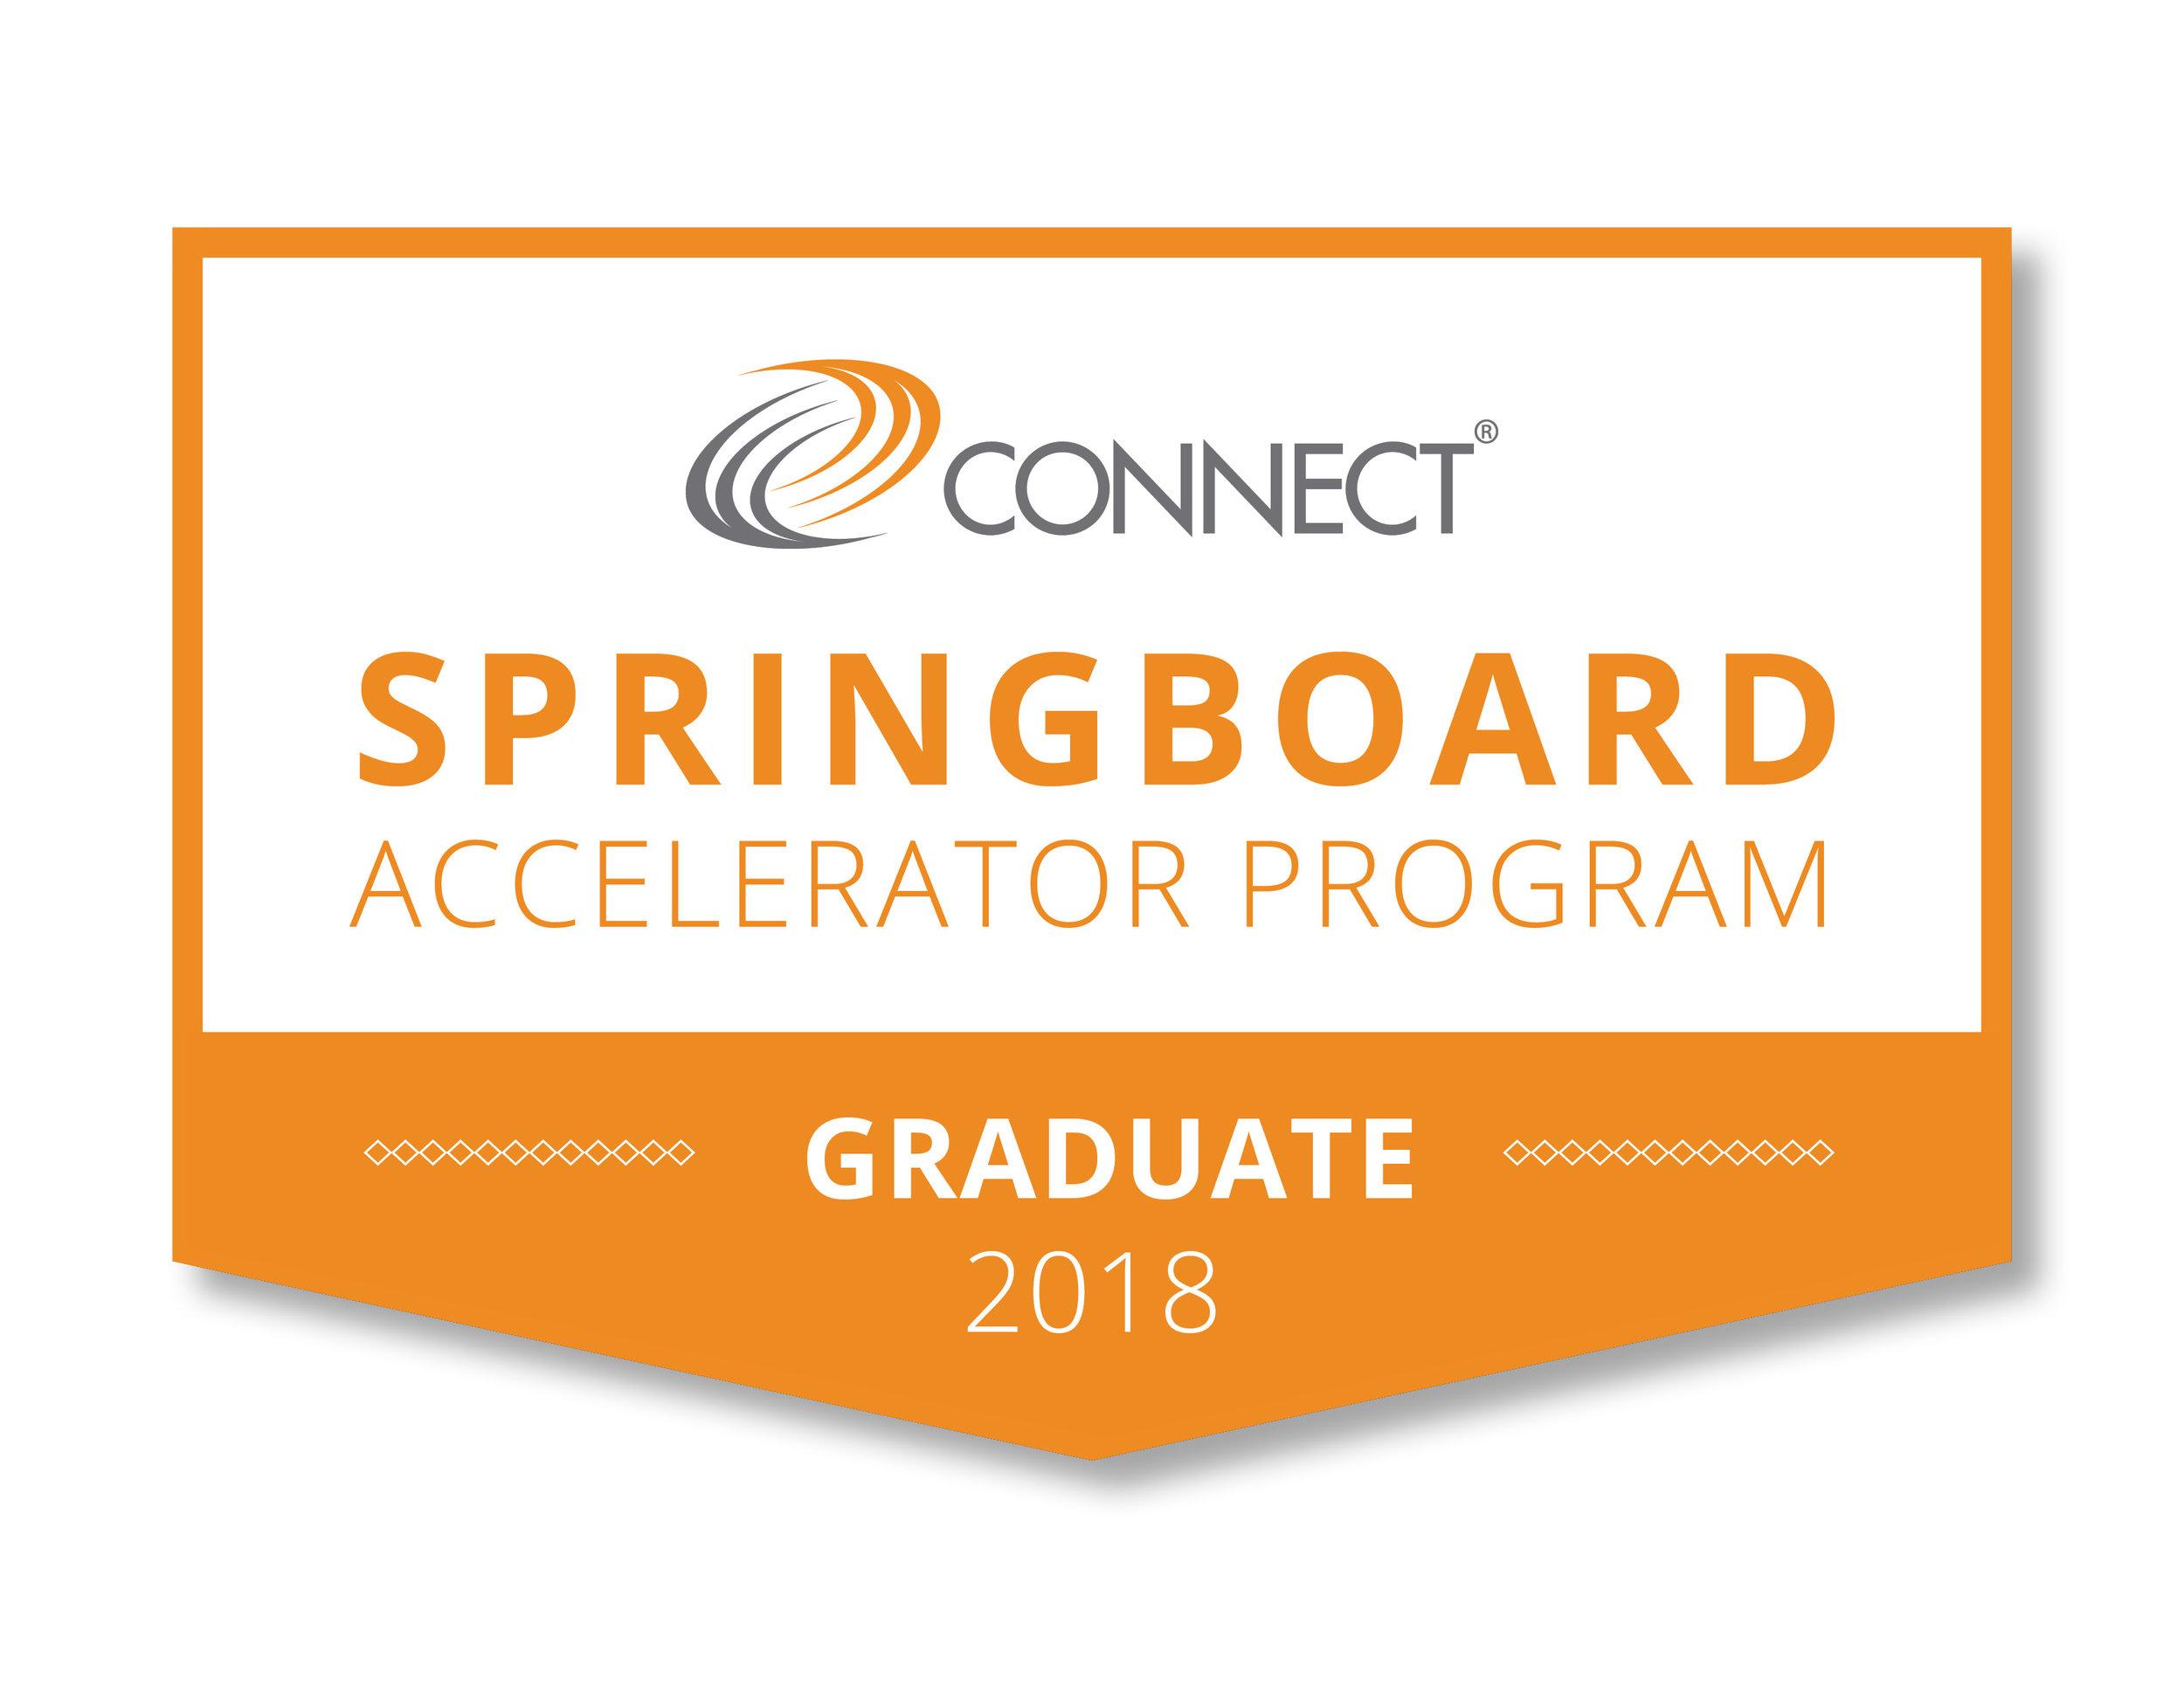 Springboard-badge-Graduate-2018.jpg